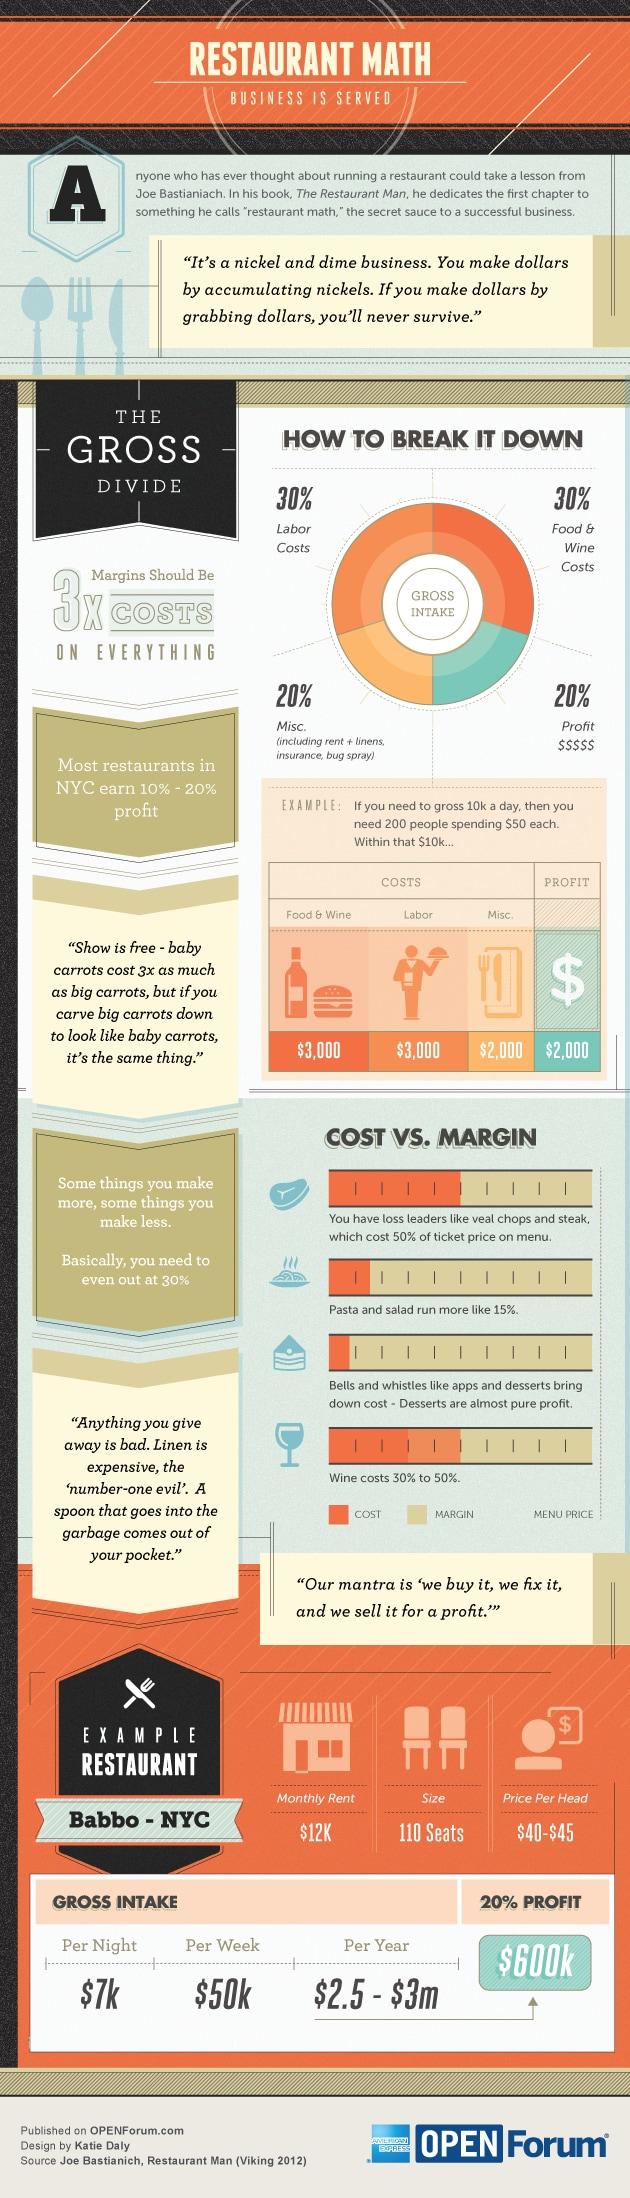 Restaurant Math: Formula for Profitability